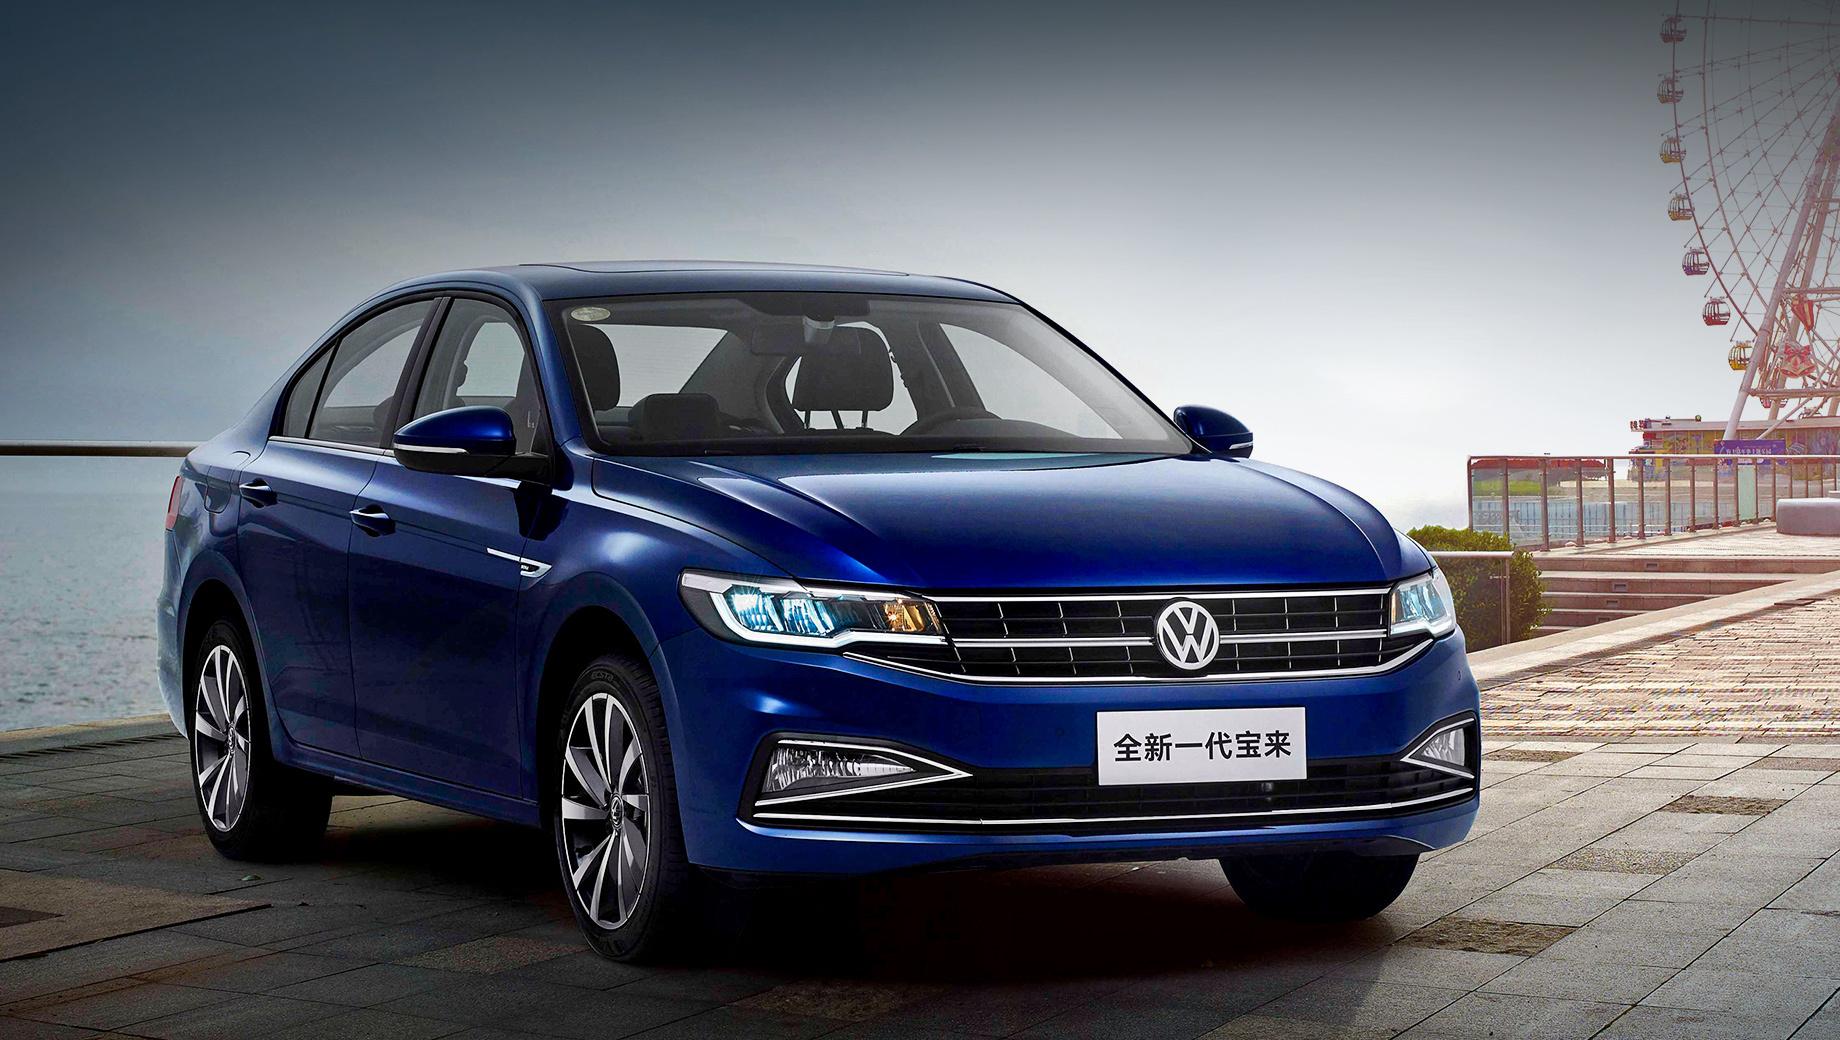 Volkswagen Bora променяет атмосферник 1.5 на турбомотор 1.2